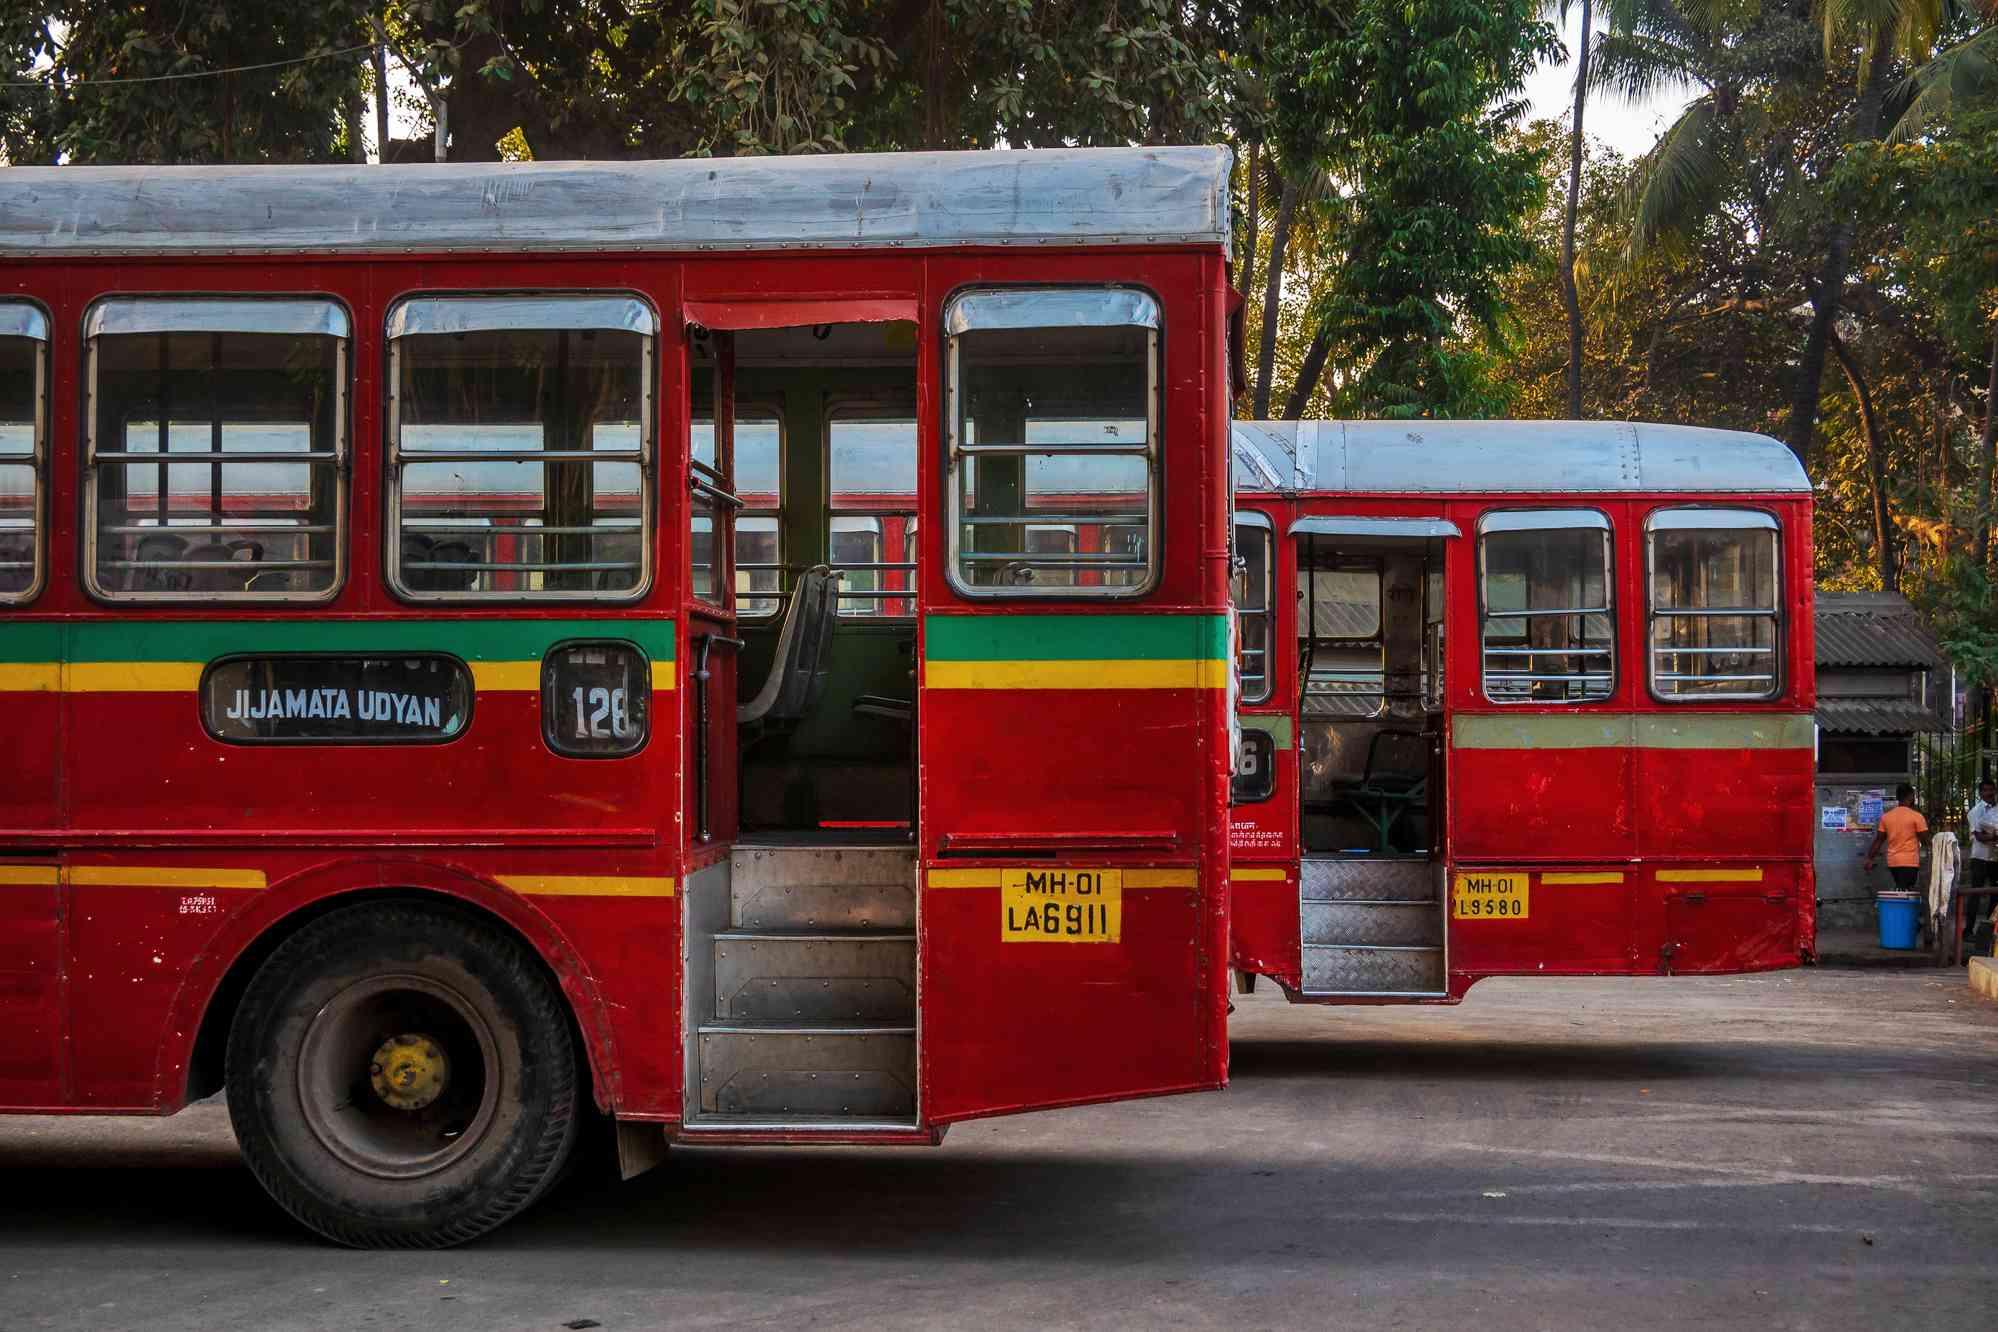 Buses in Mumbai.